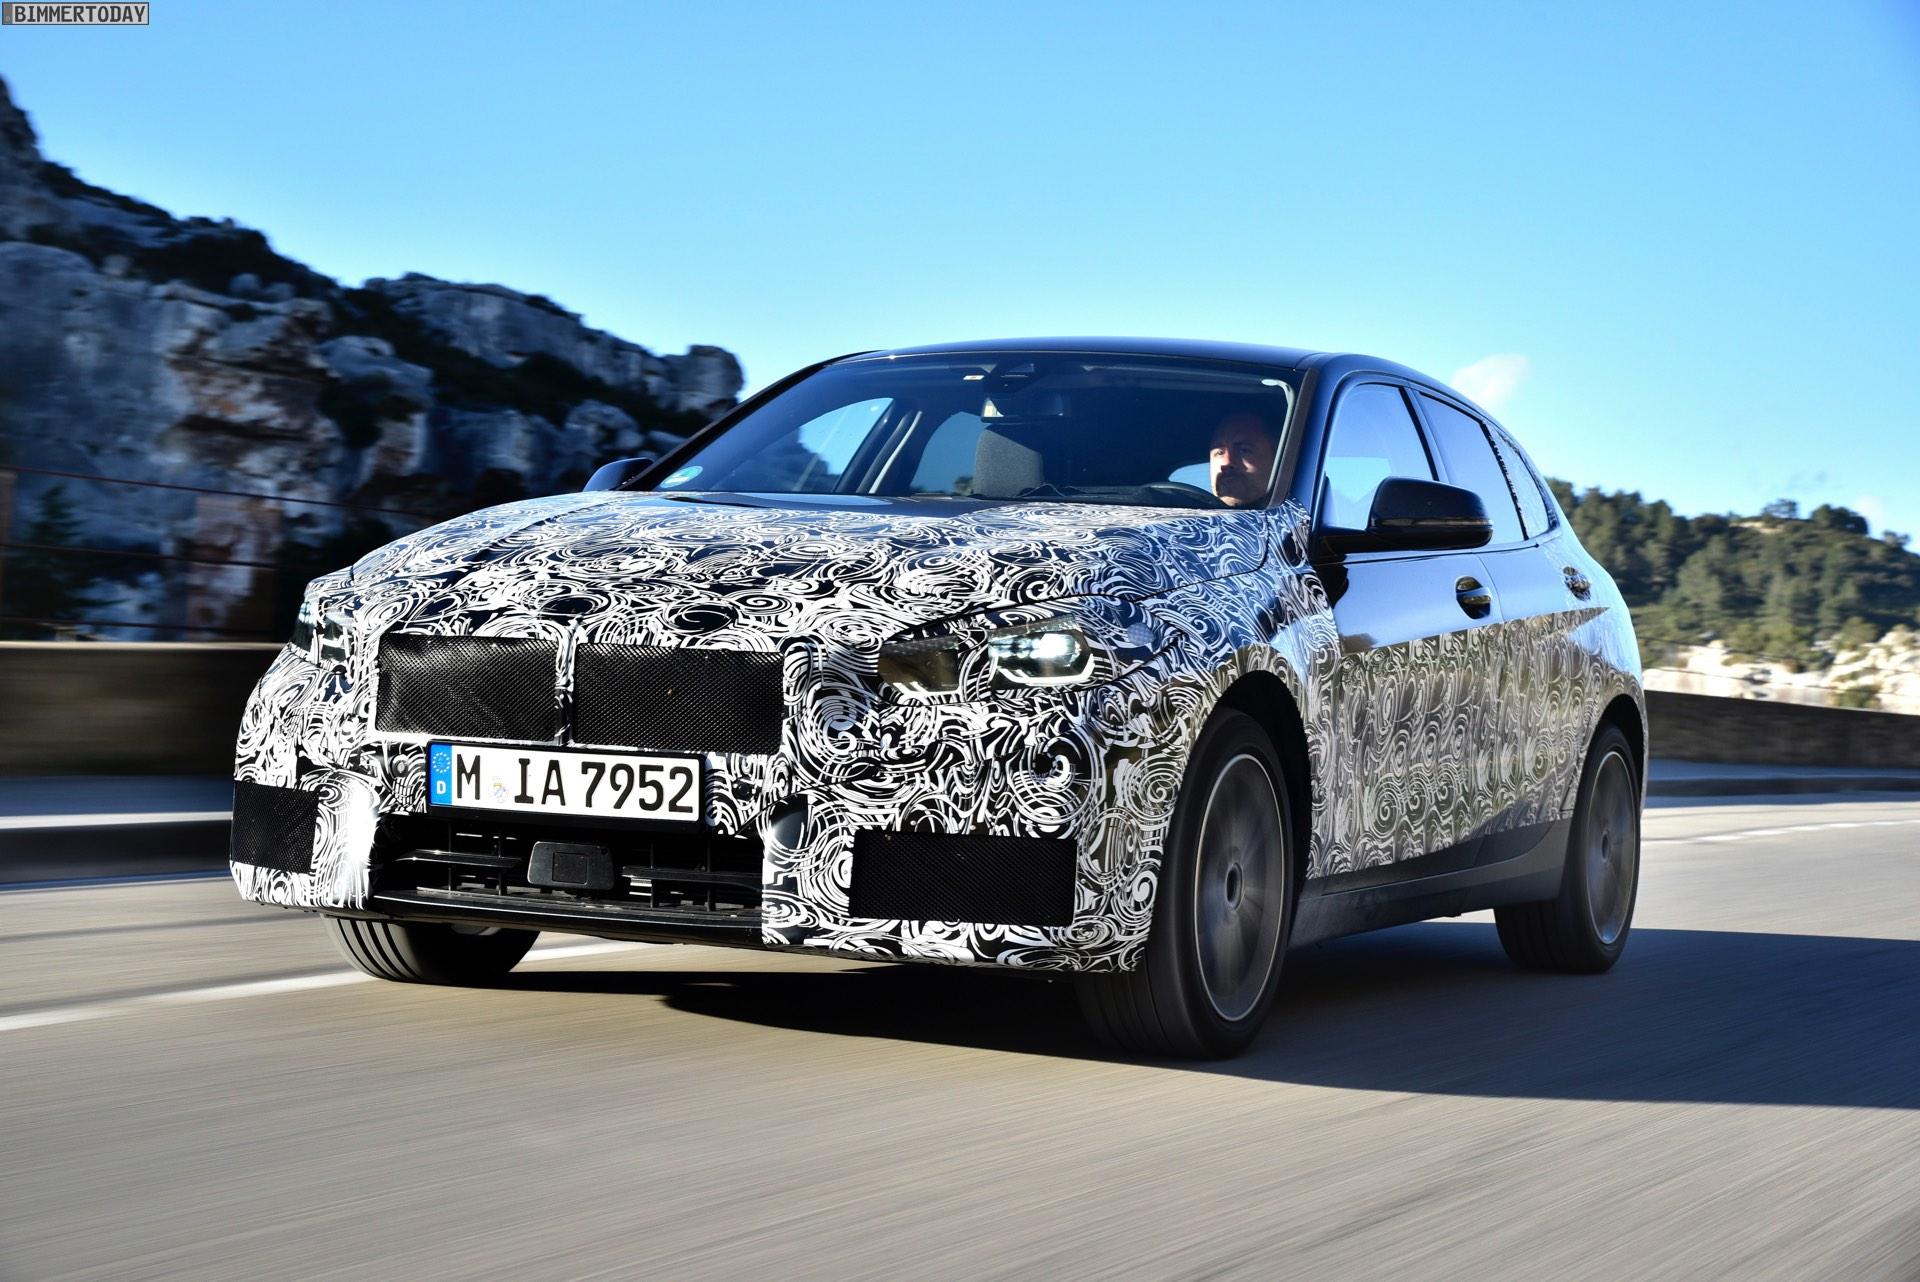 2019 BMW 1er F40 Spyshots Vorab Fahrbericht 118i 02